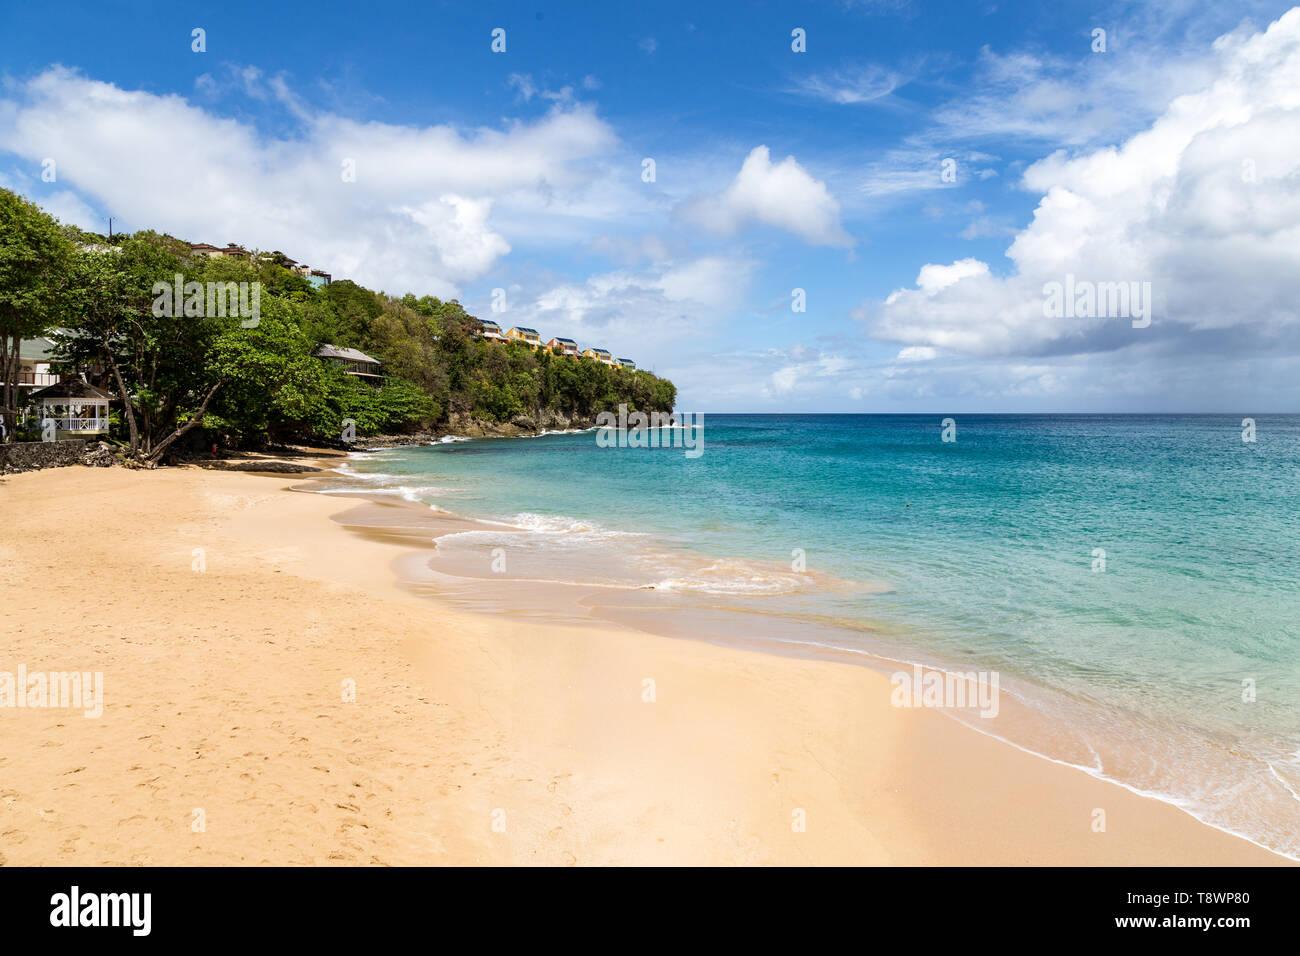 La Toc Beach, St Lucia, Caribbean - Stock Image